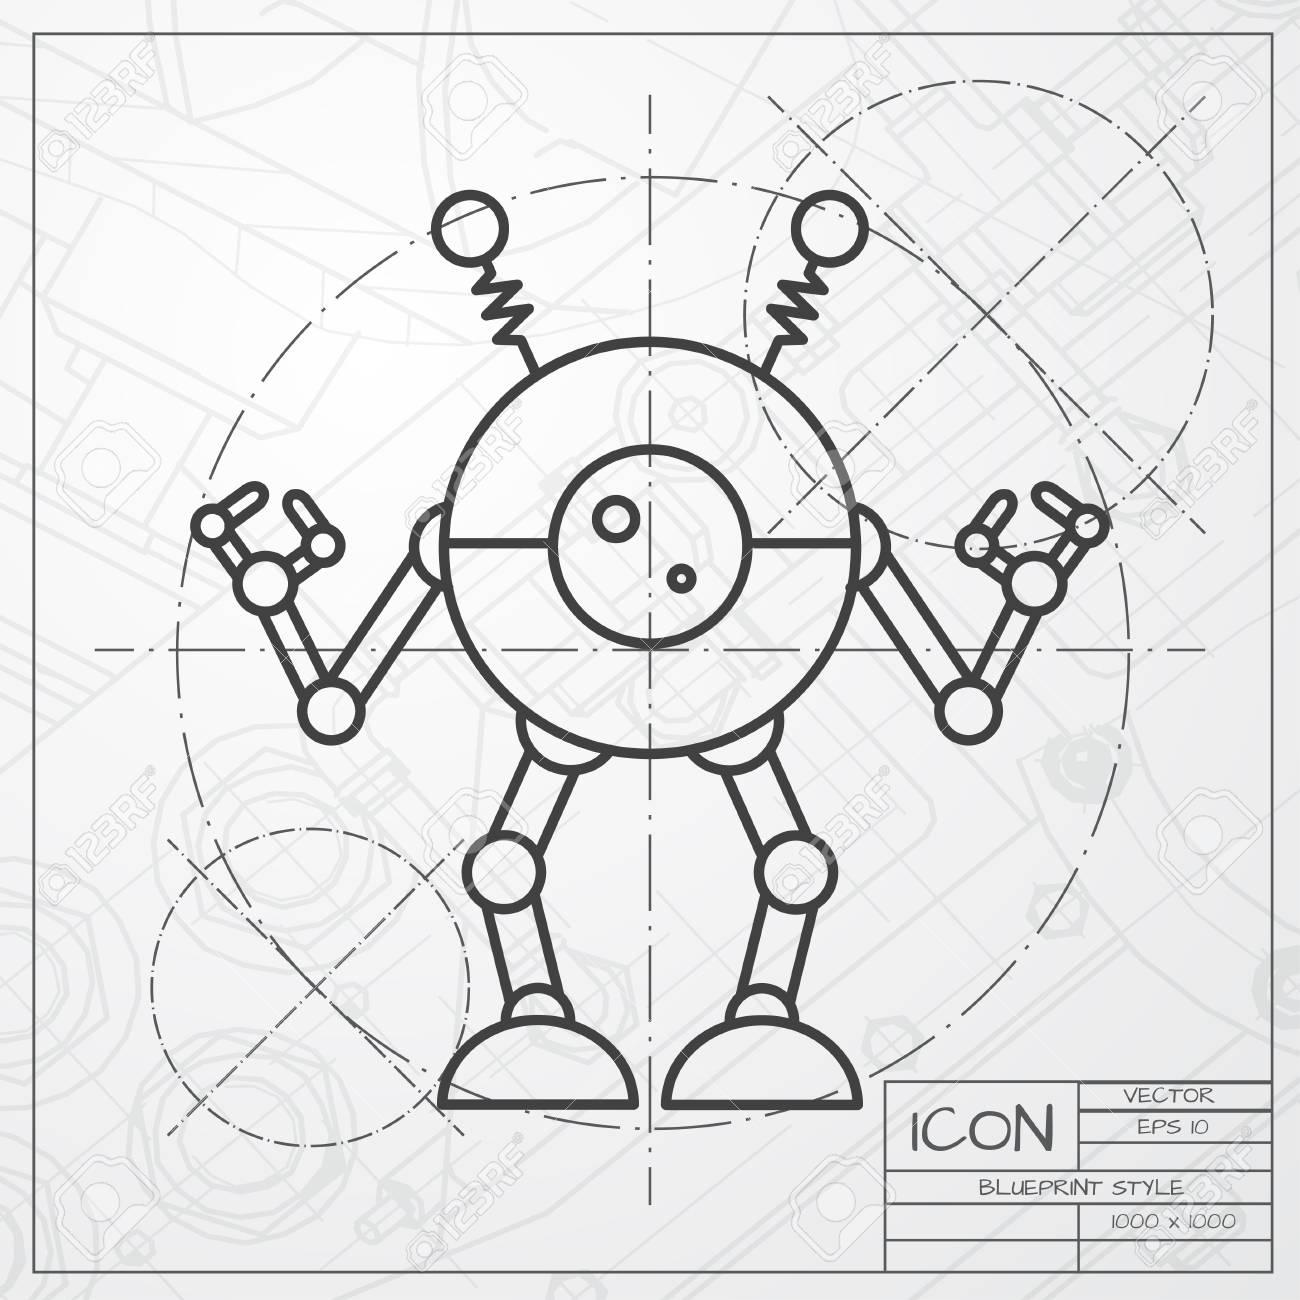 Vector Classic Blueprint Of Retro Robot Toy Icon On Engineer ...